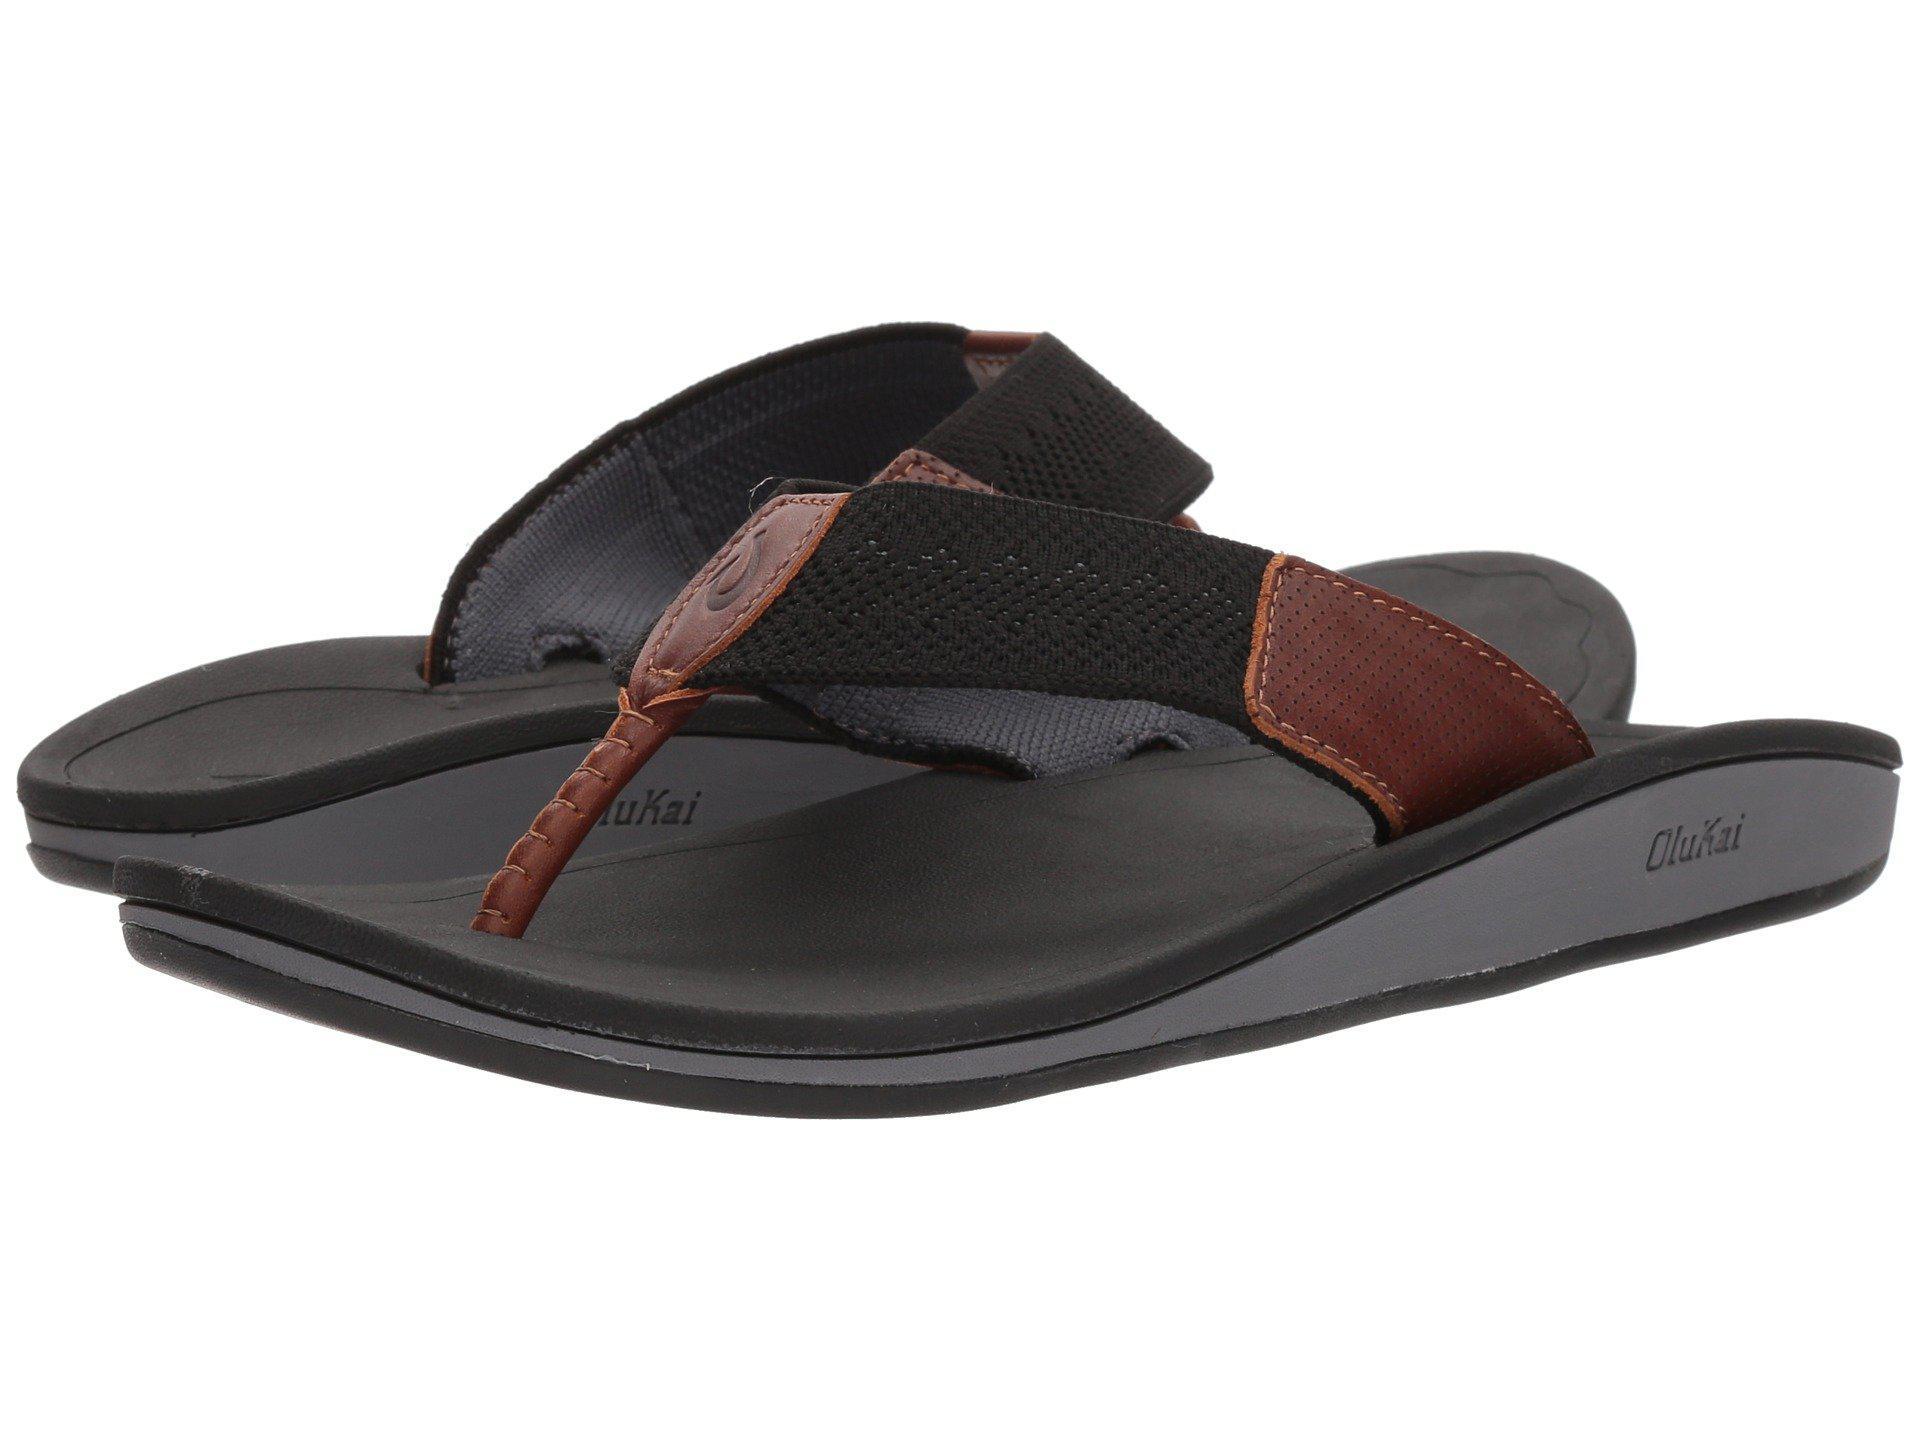 56e6c9103ace Lyst - Olukai Nohona Ulana (black black) Men s Sandals in Black for Men